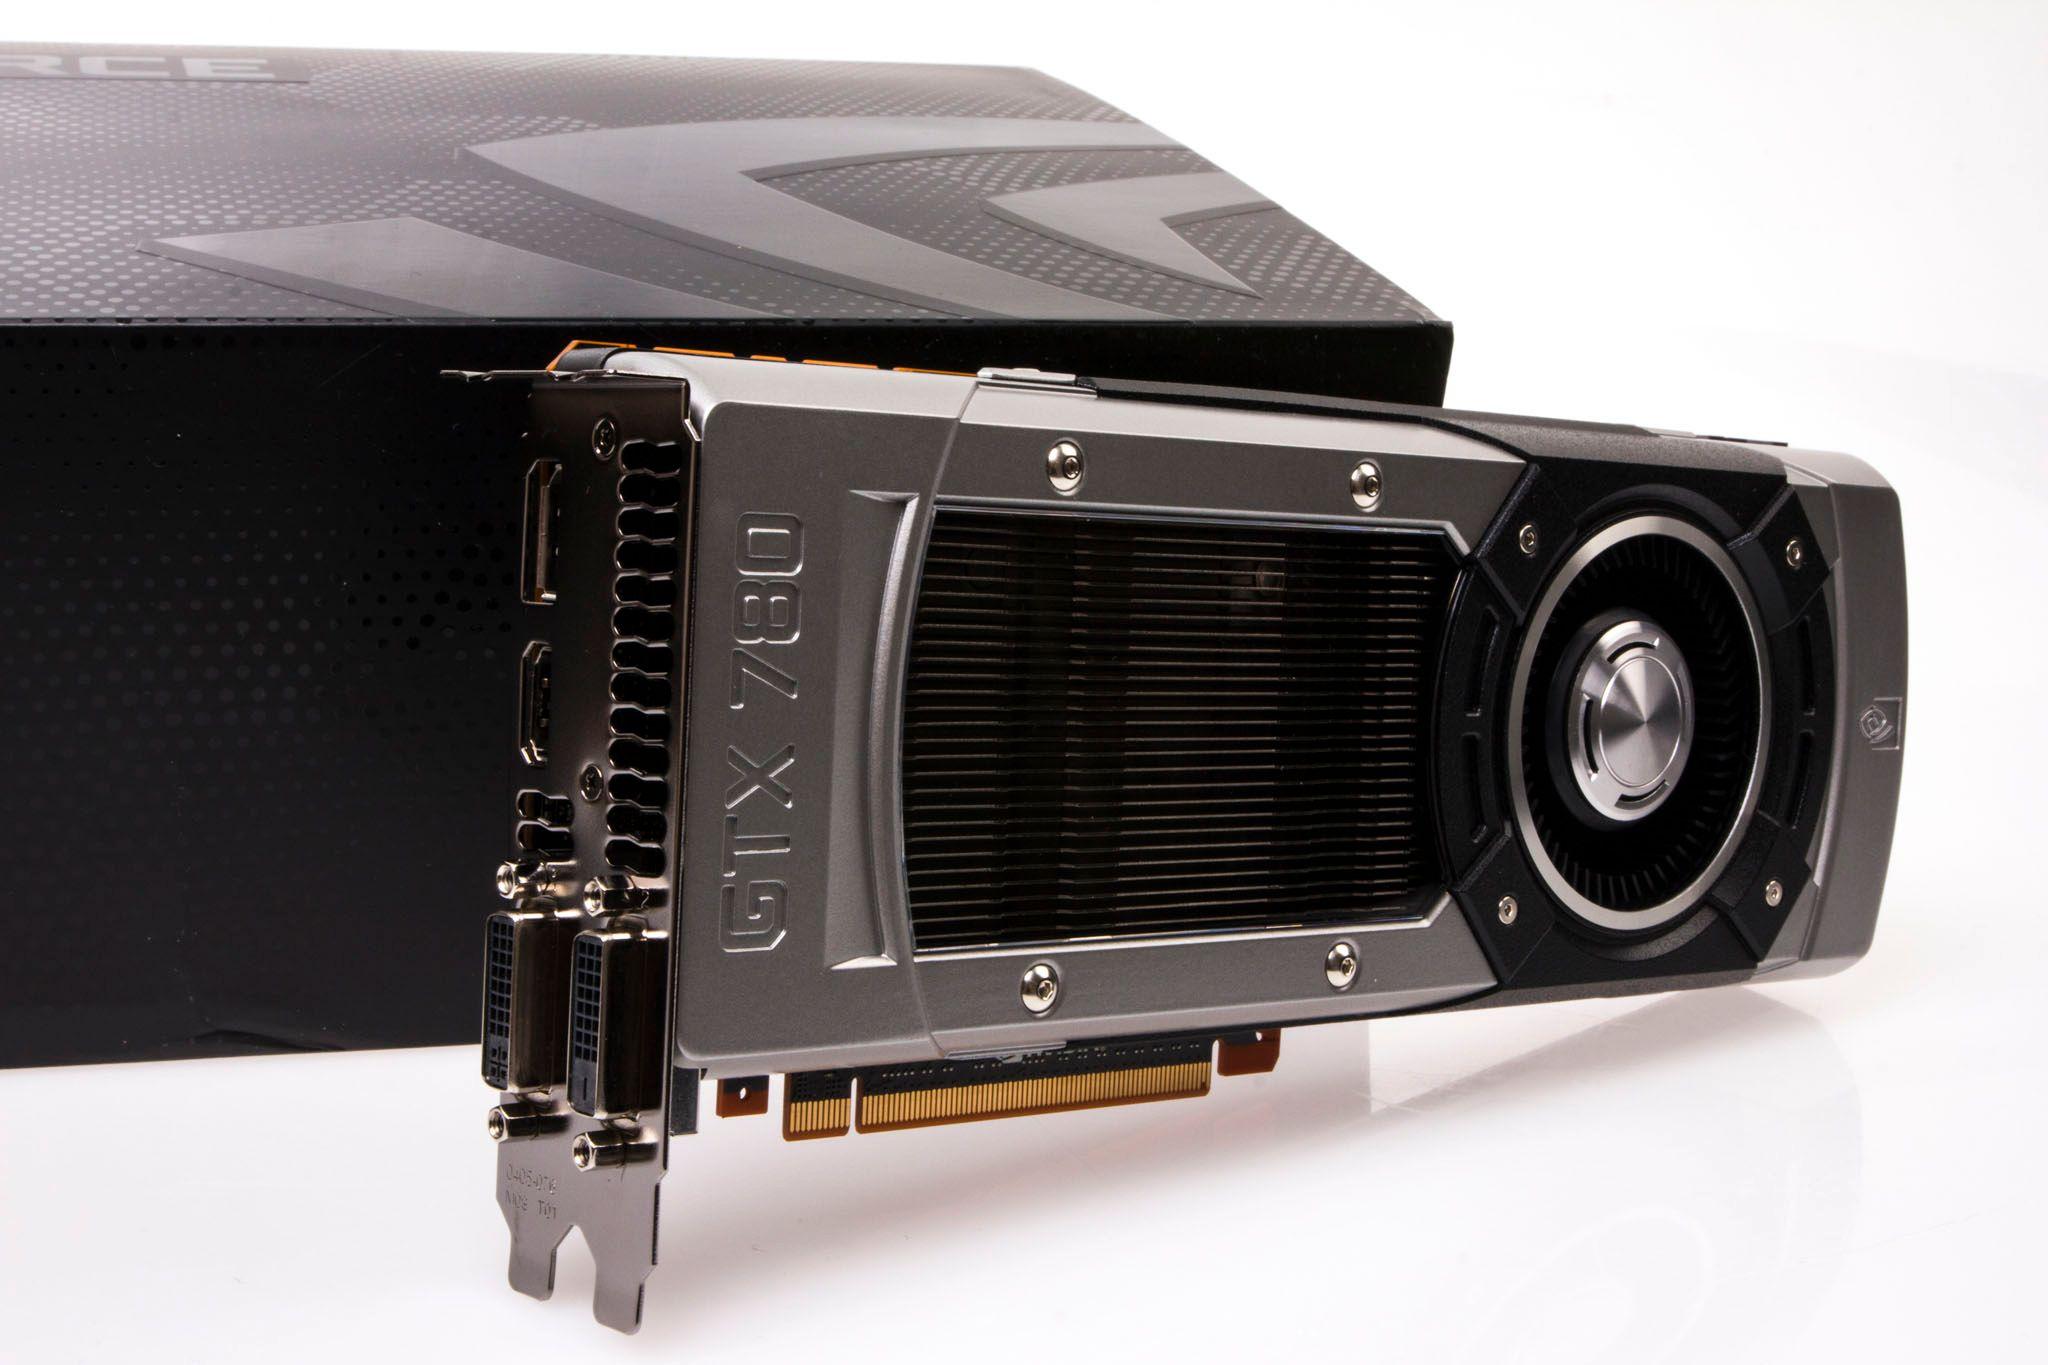 Nvidia GeForce GTX 780.Foto: Varg Aamo, Hardware.no